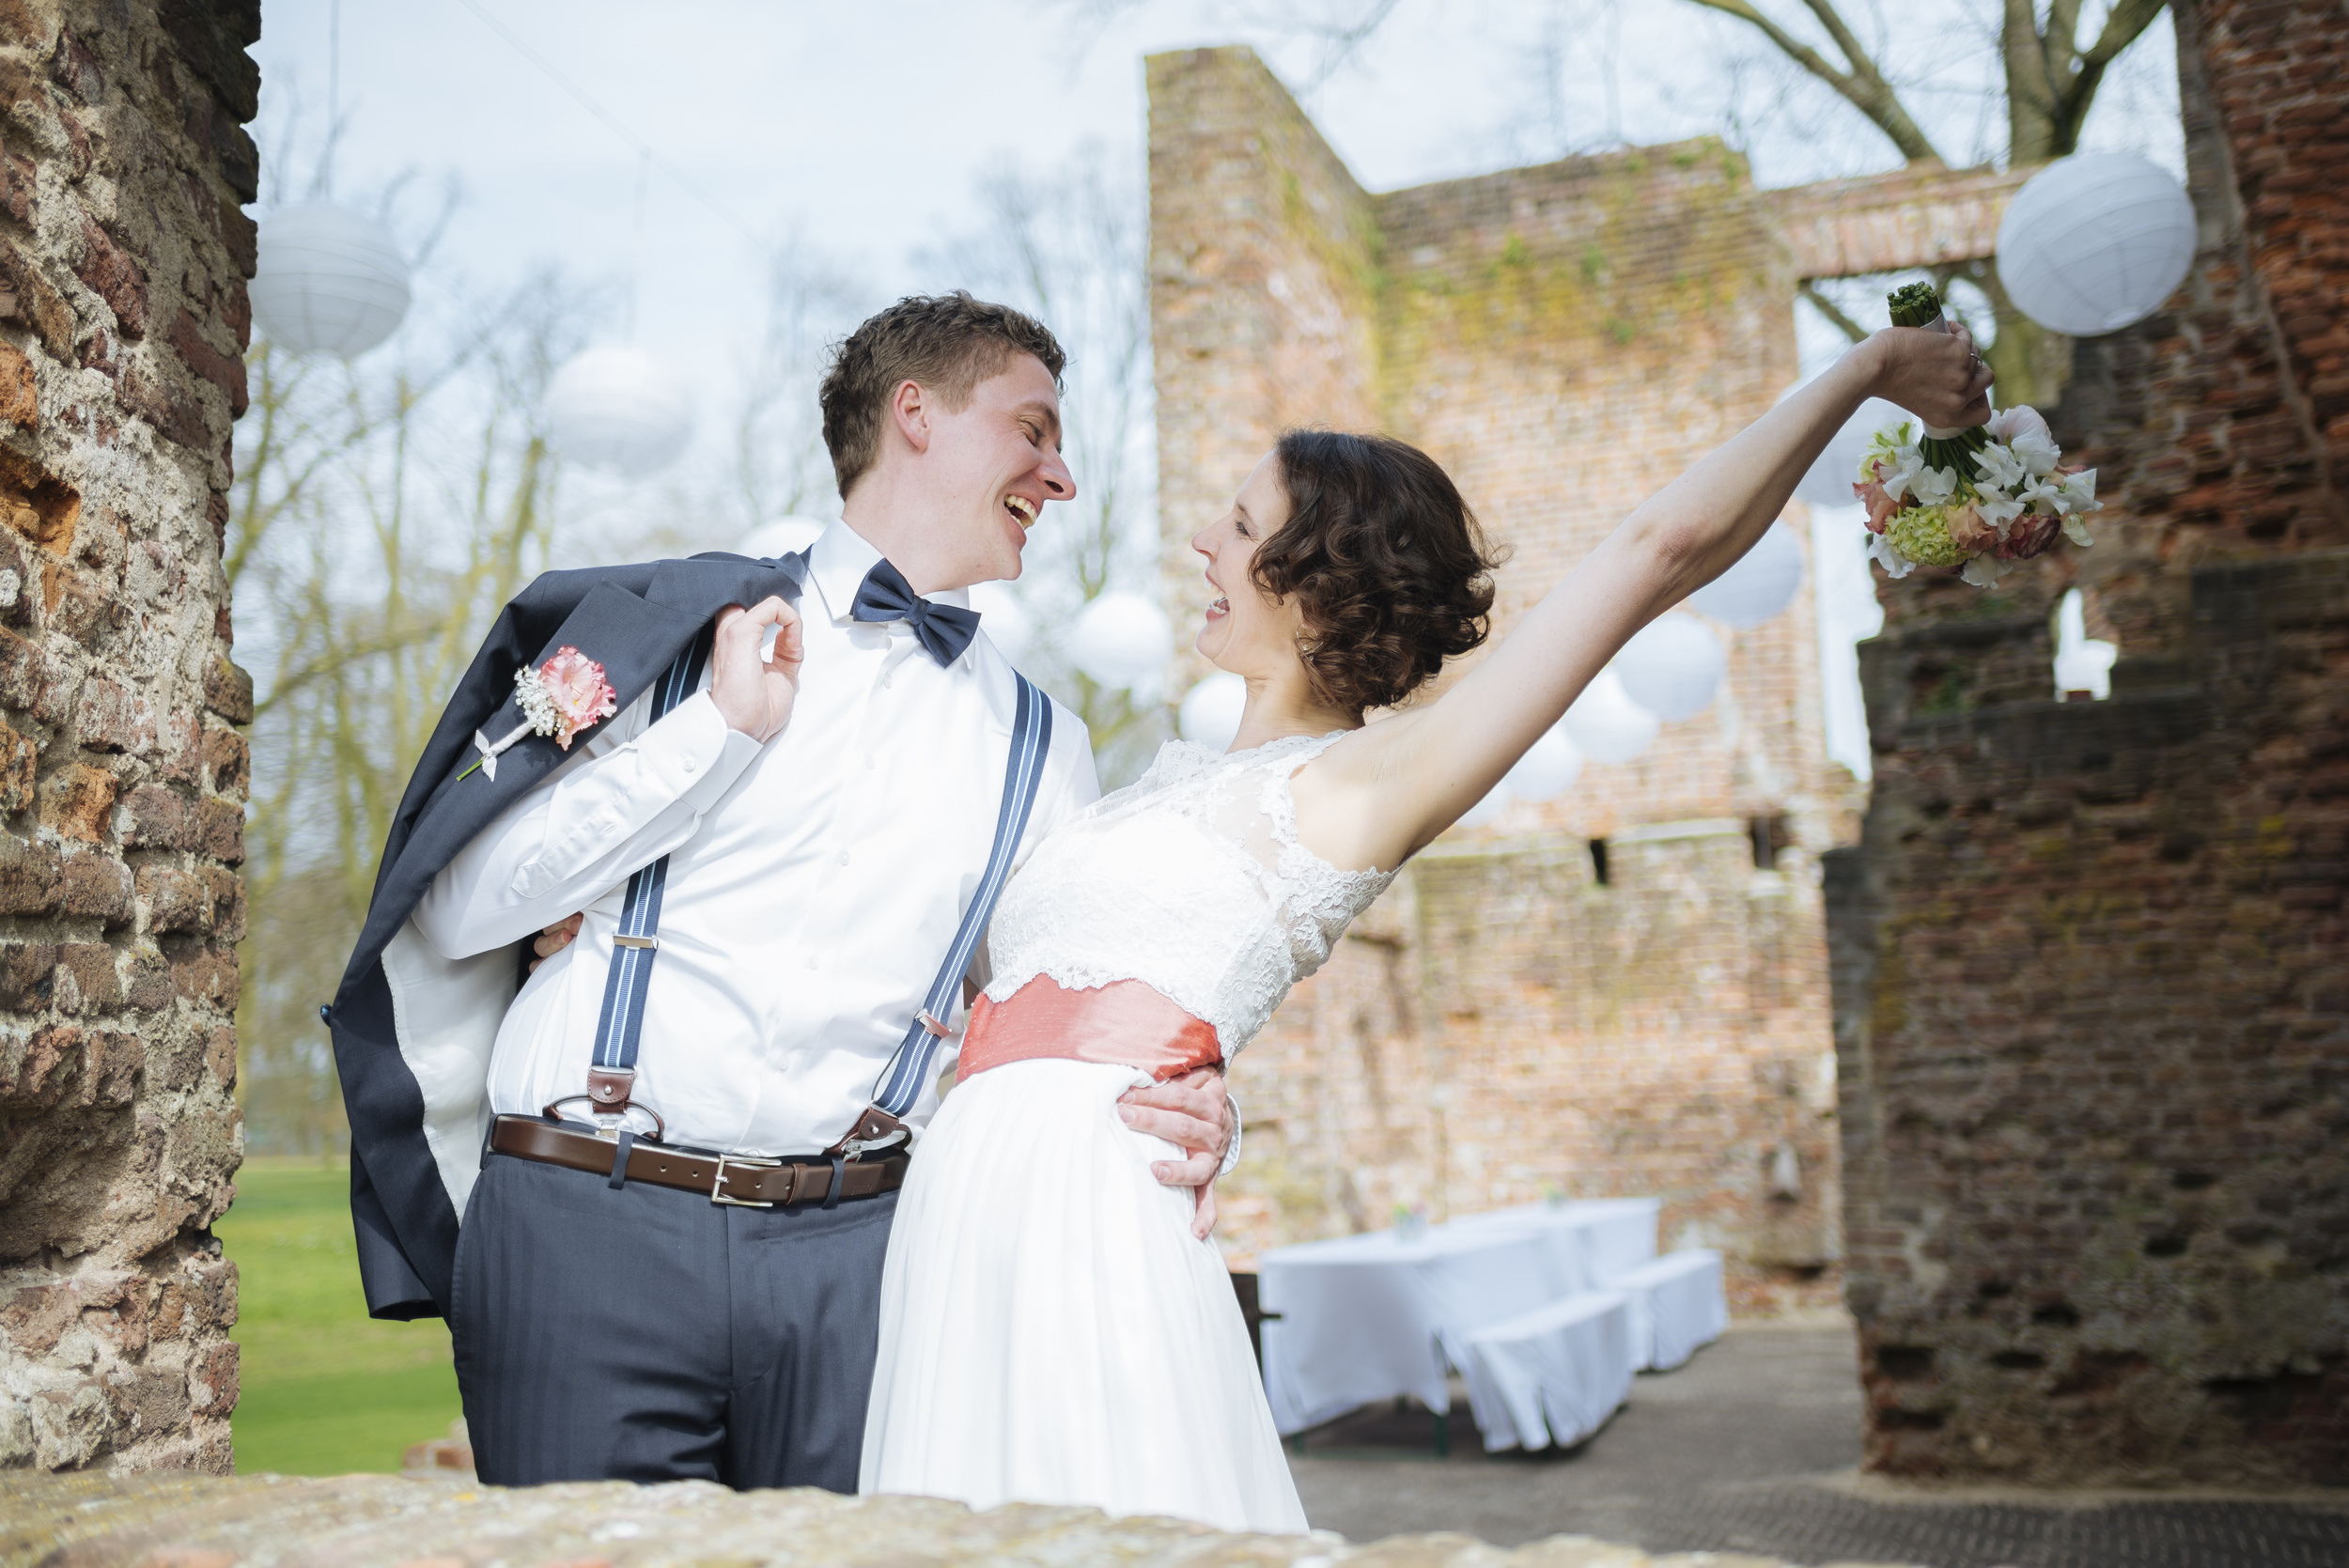 Hochzeitsfotograf-Schlossruine-Hertefeld-Weeze-026.jpg